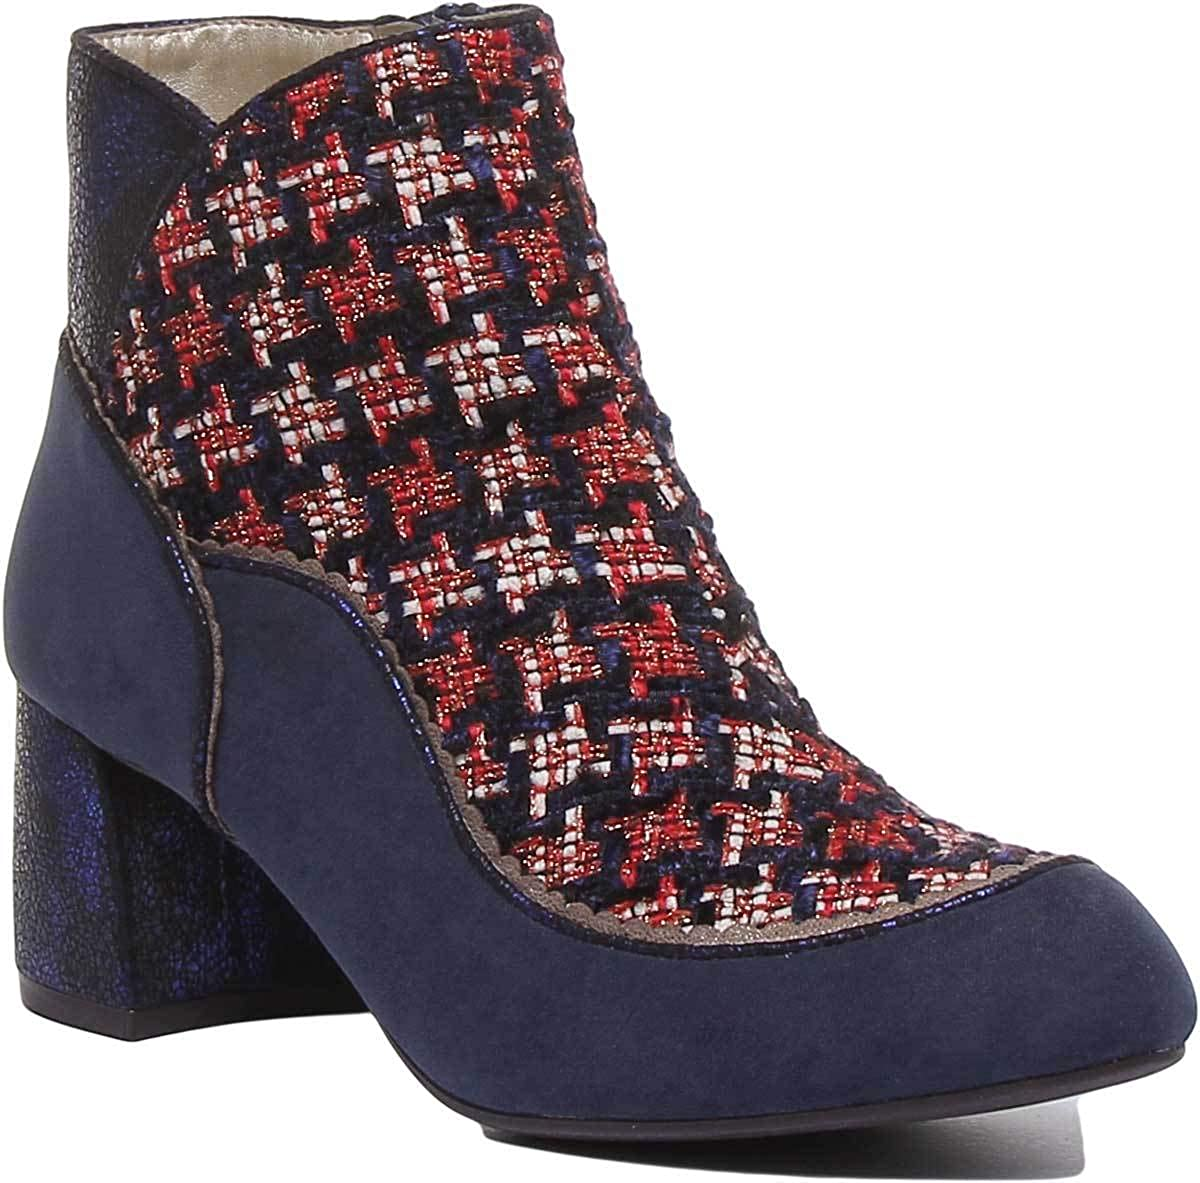 Ruby Shoo Karolina Femme Boots Navy